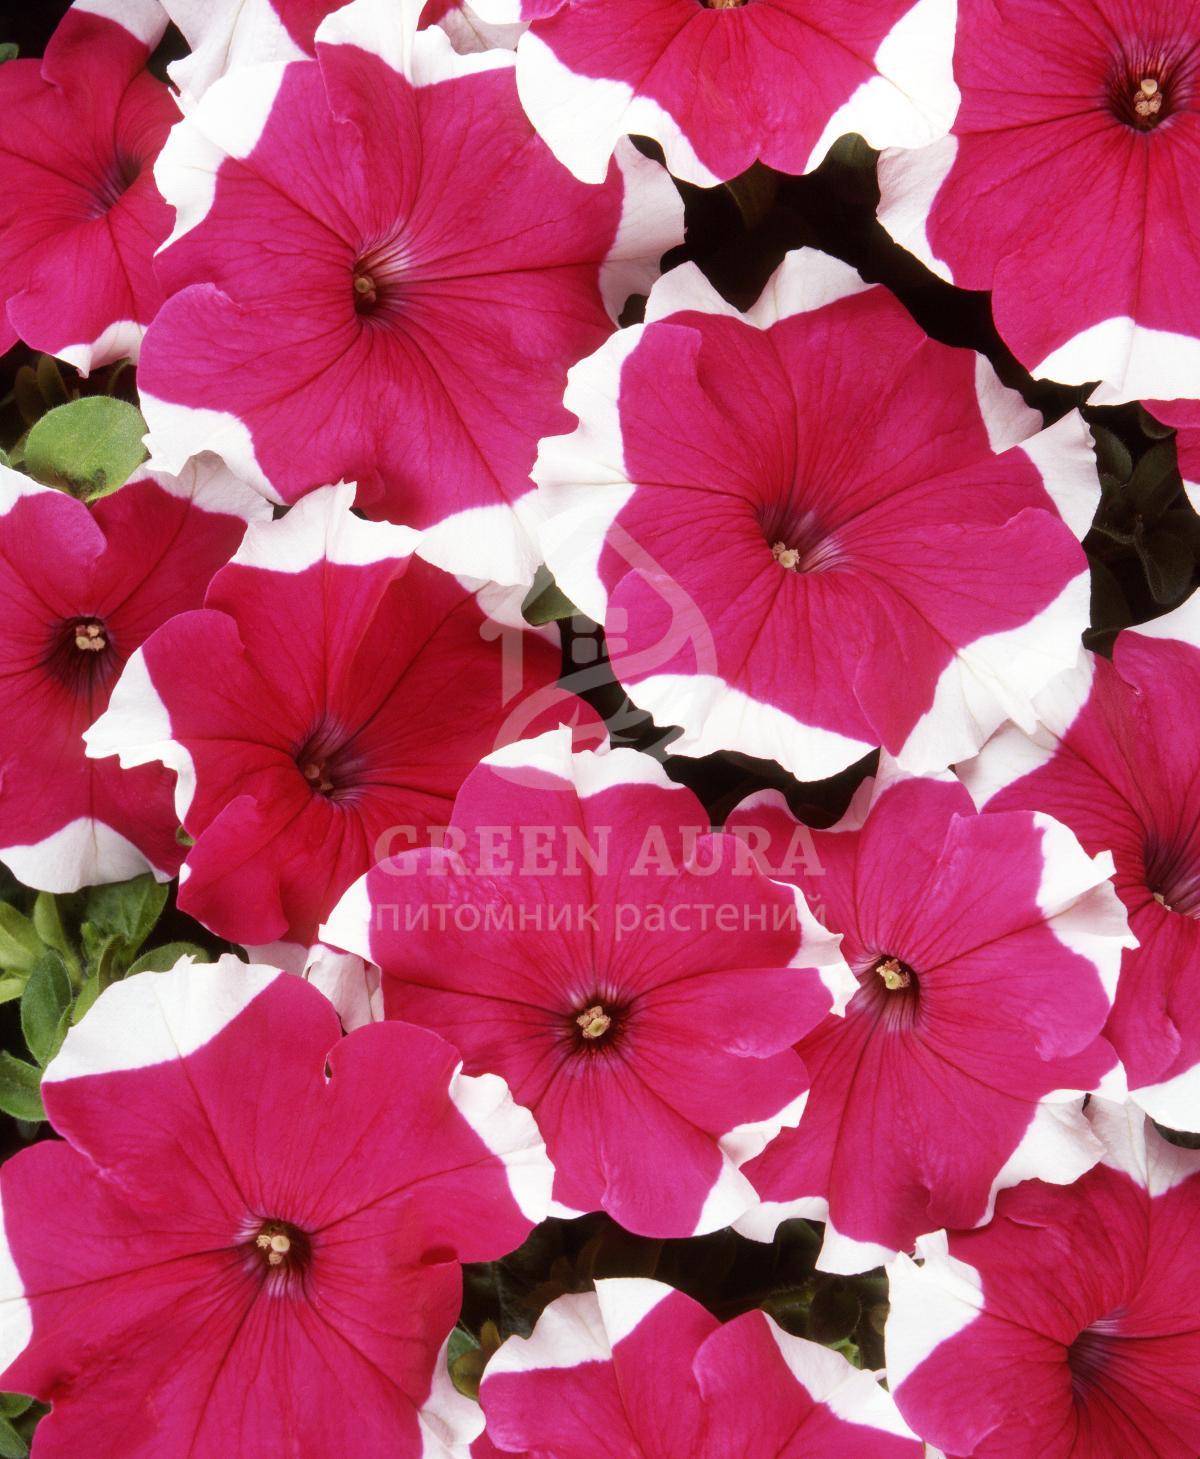 Петуния крупноцветковая фото цветов